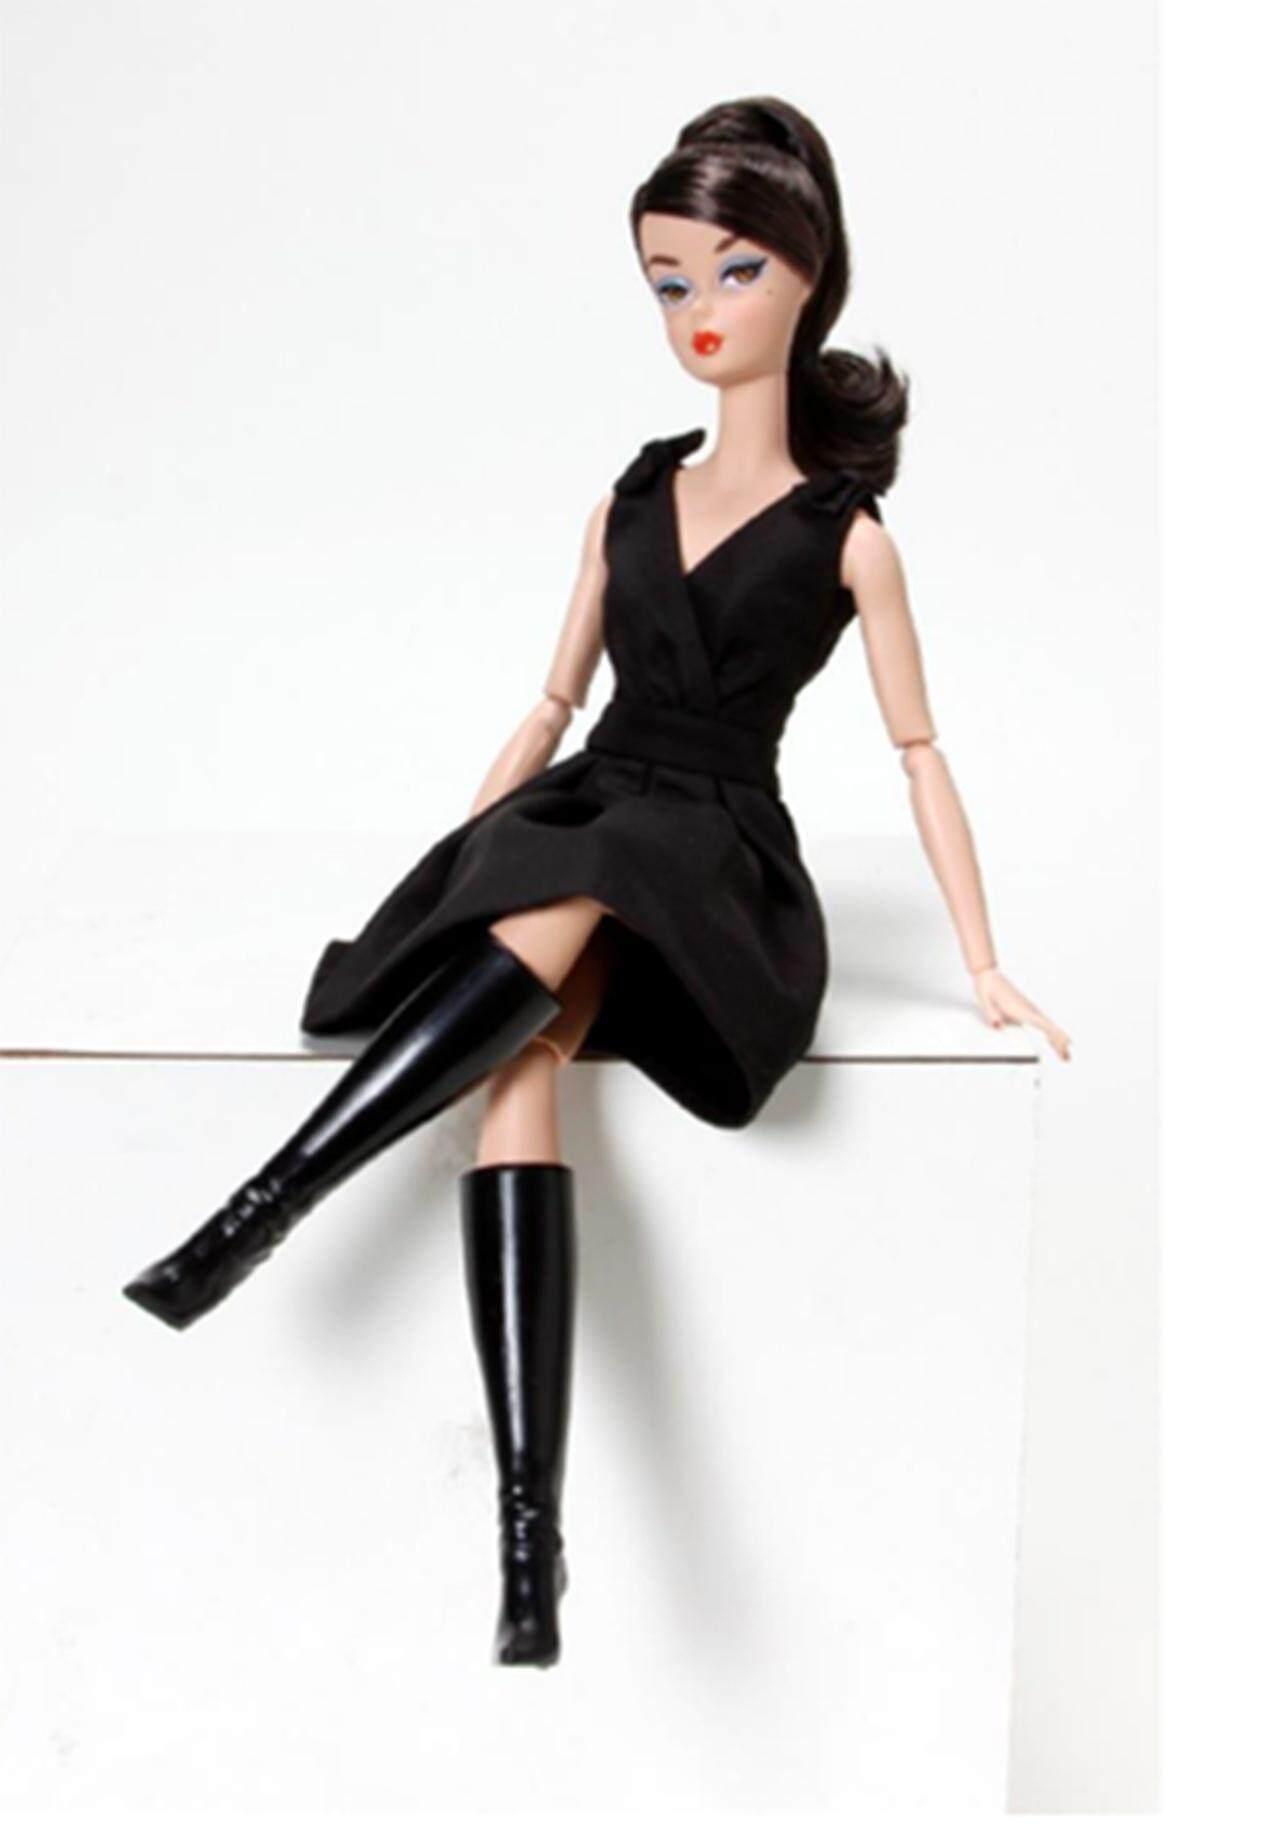 [BARBIE] Collector Classic Black Dress Doll (3 yrs+)